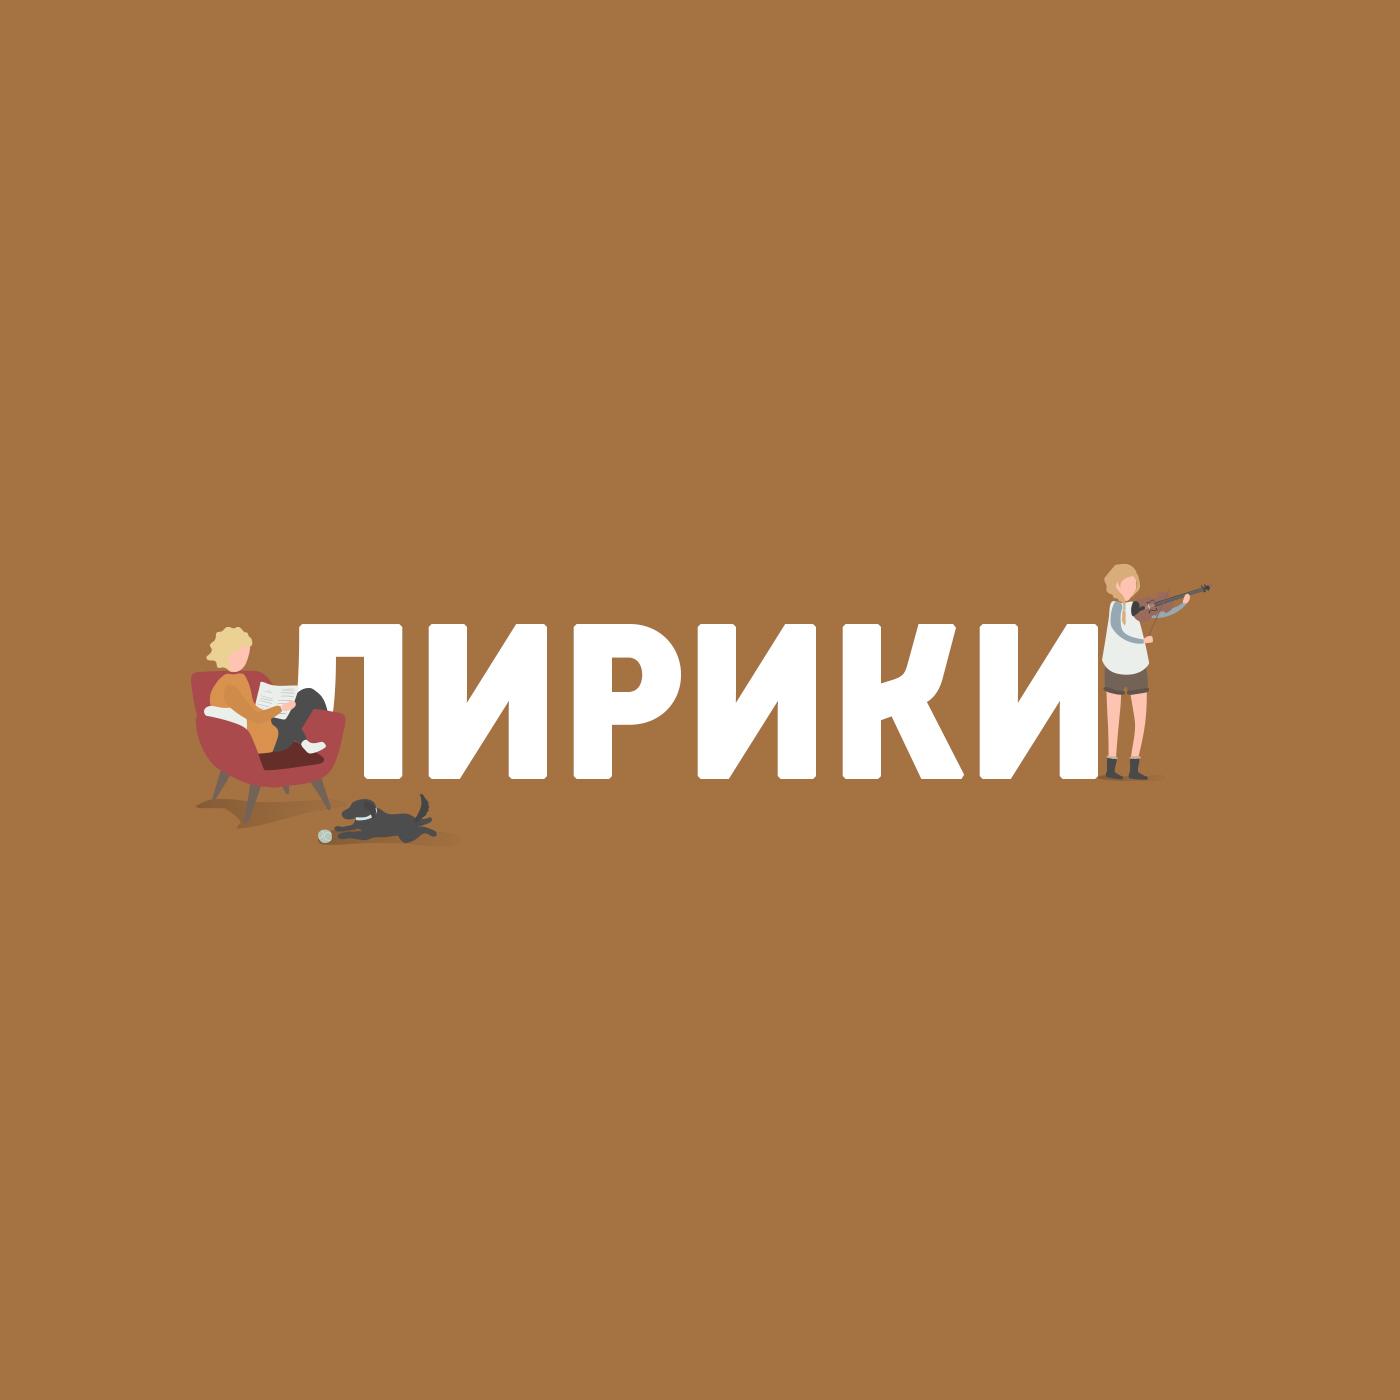 Купить книгу История терменвокса, автора Александра Пушного